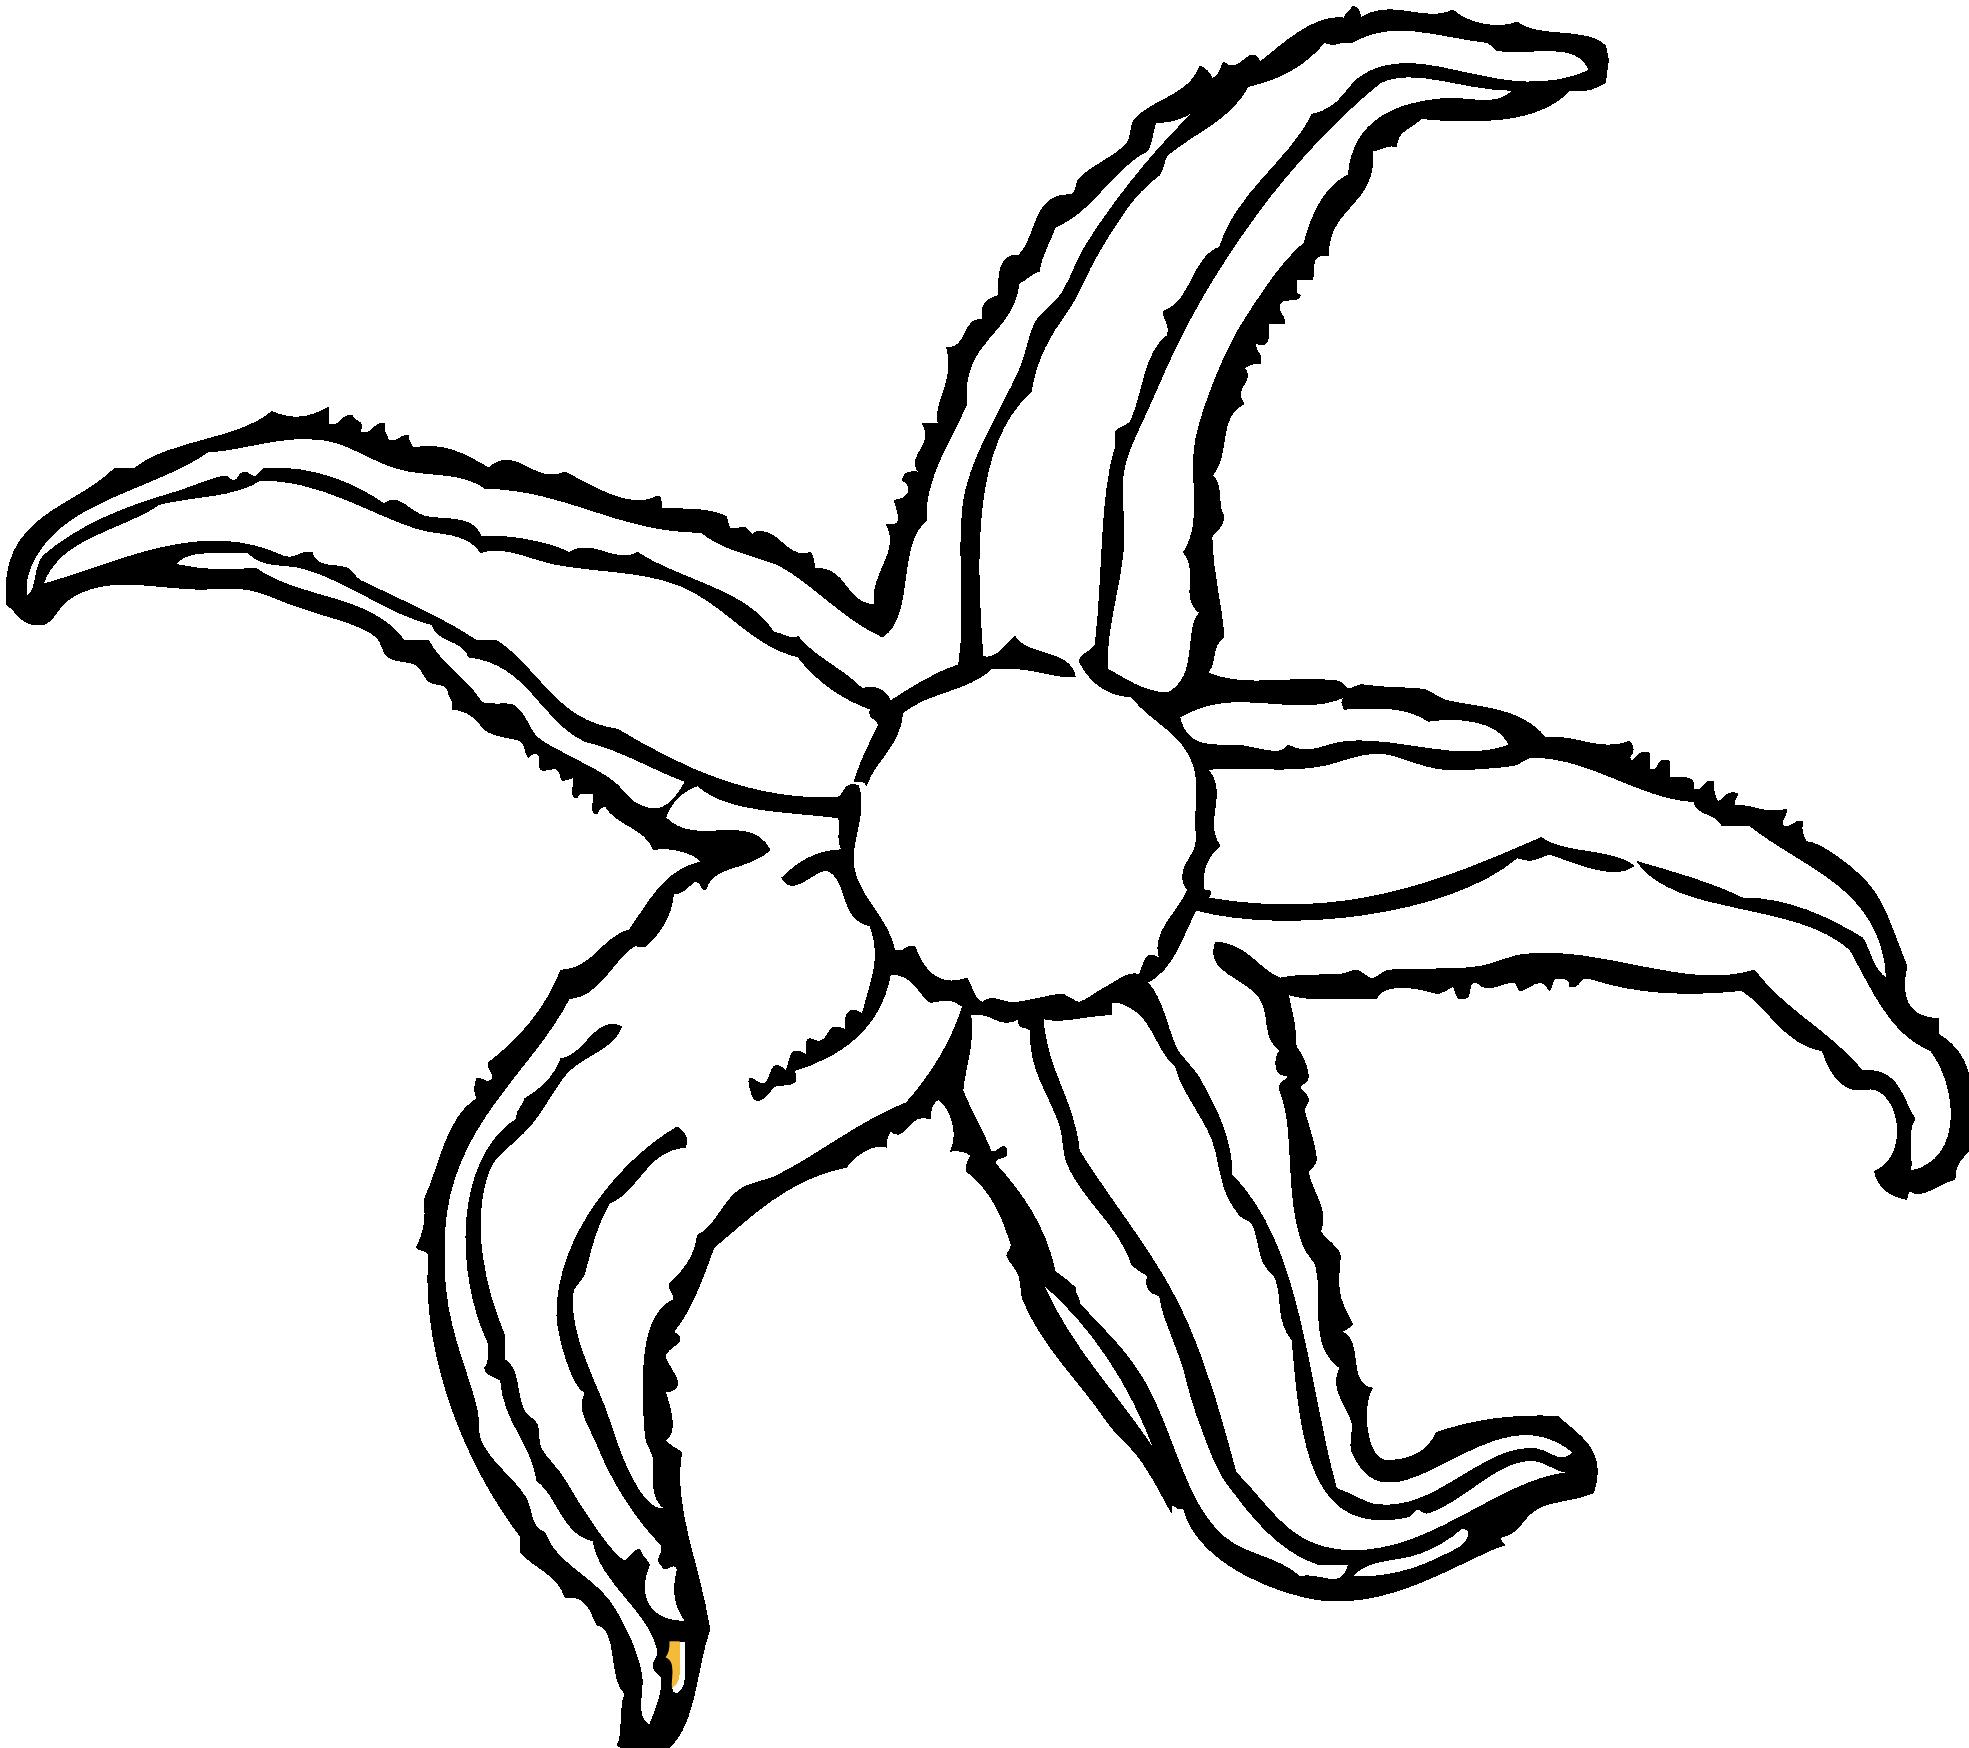 1969x1748 Starfish Clipart Black And White Clipart Panda